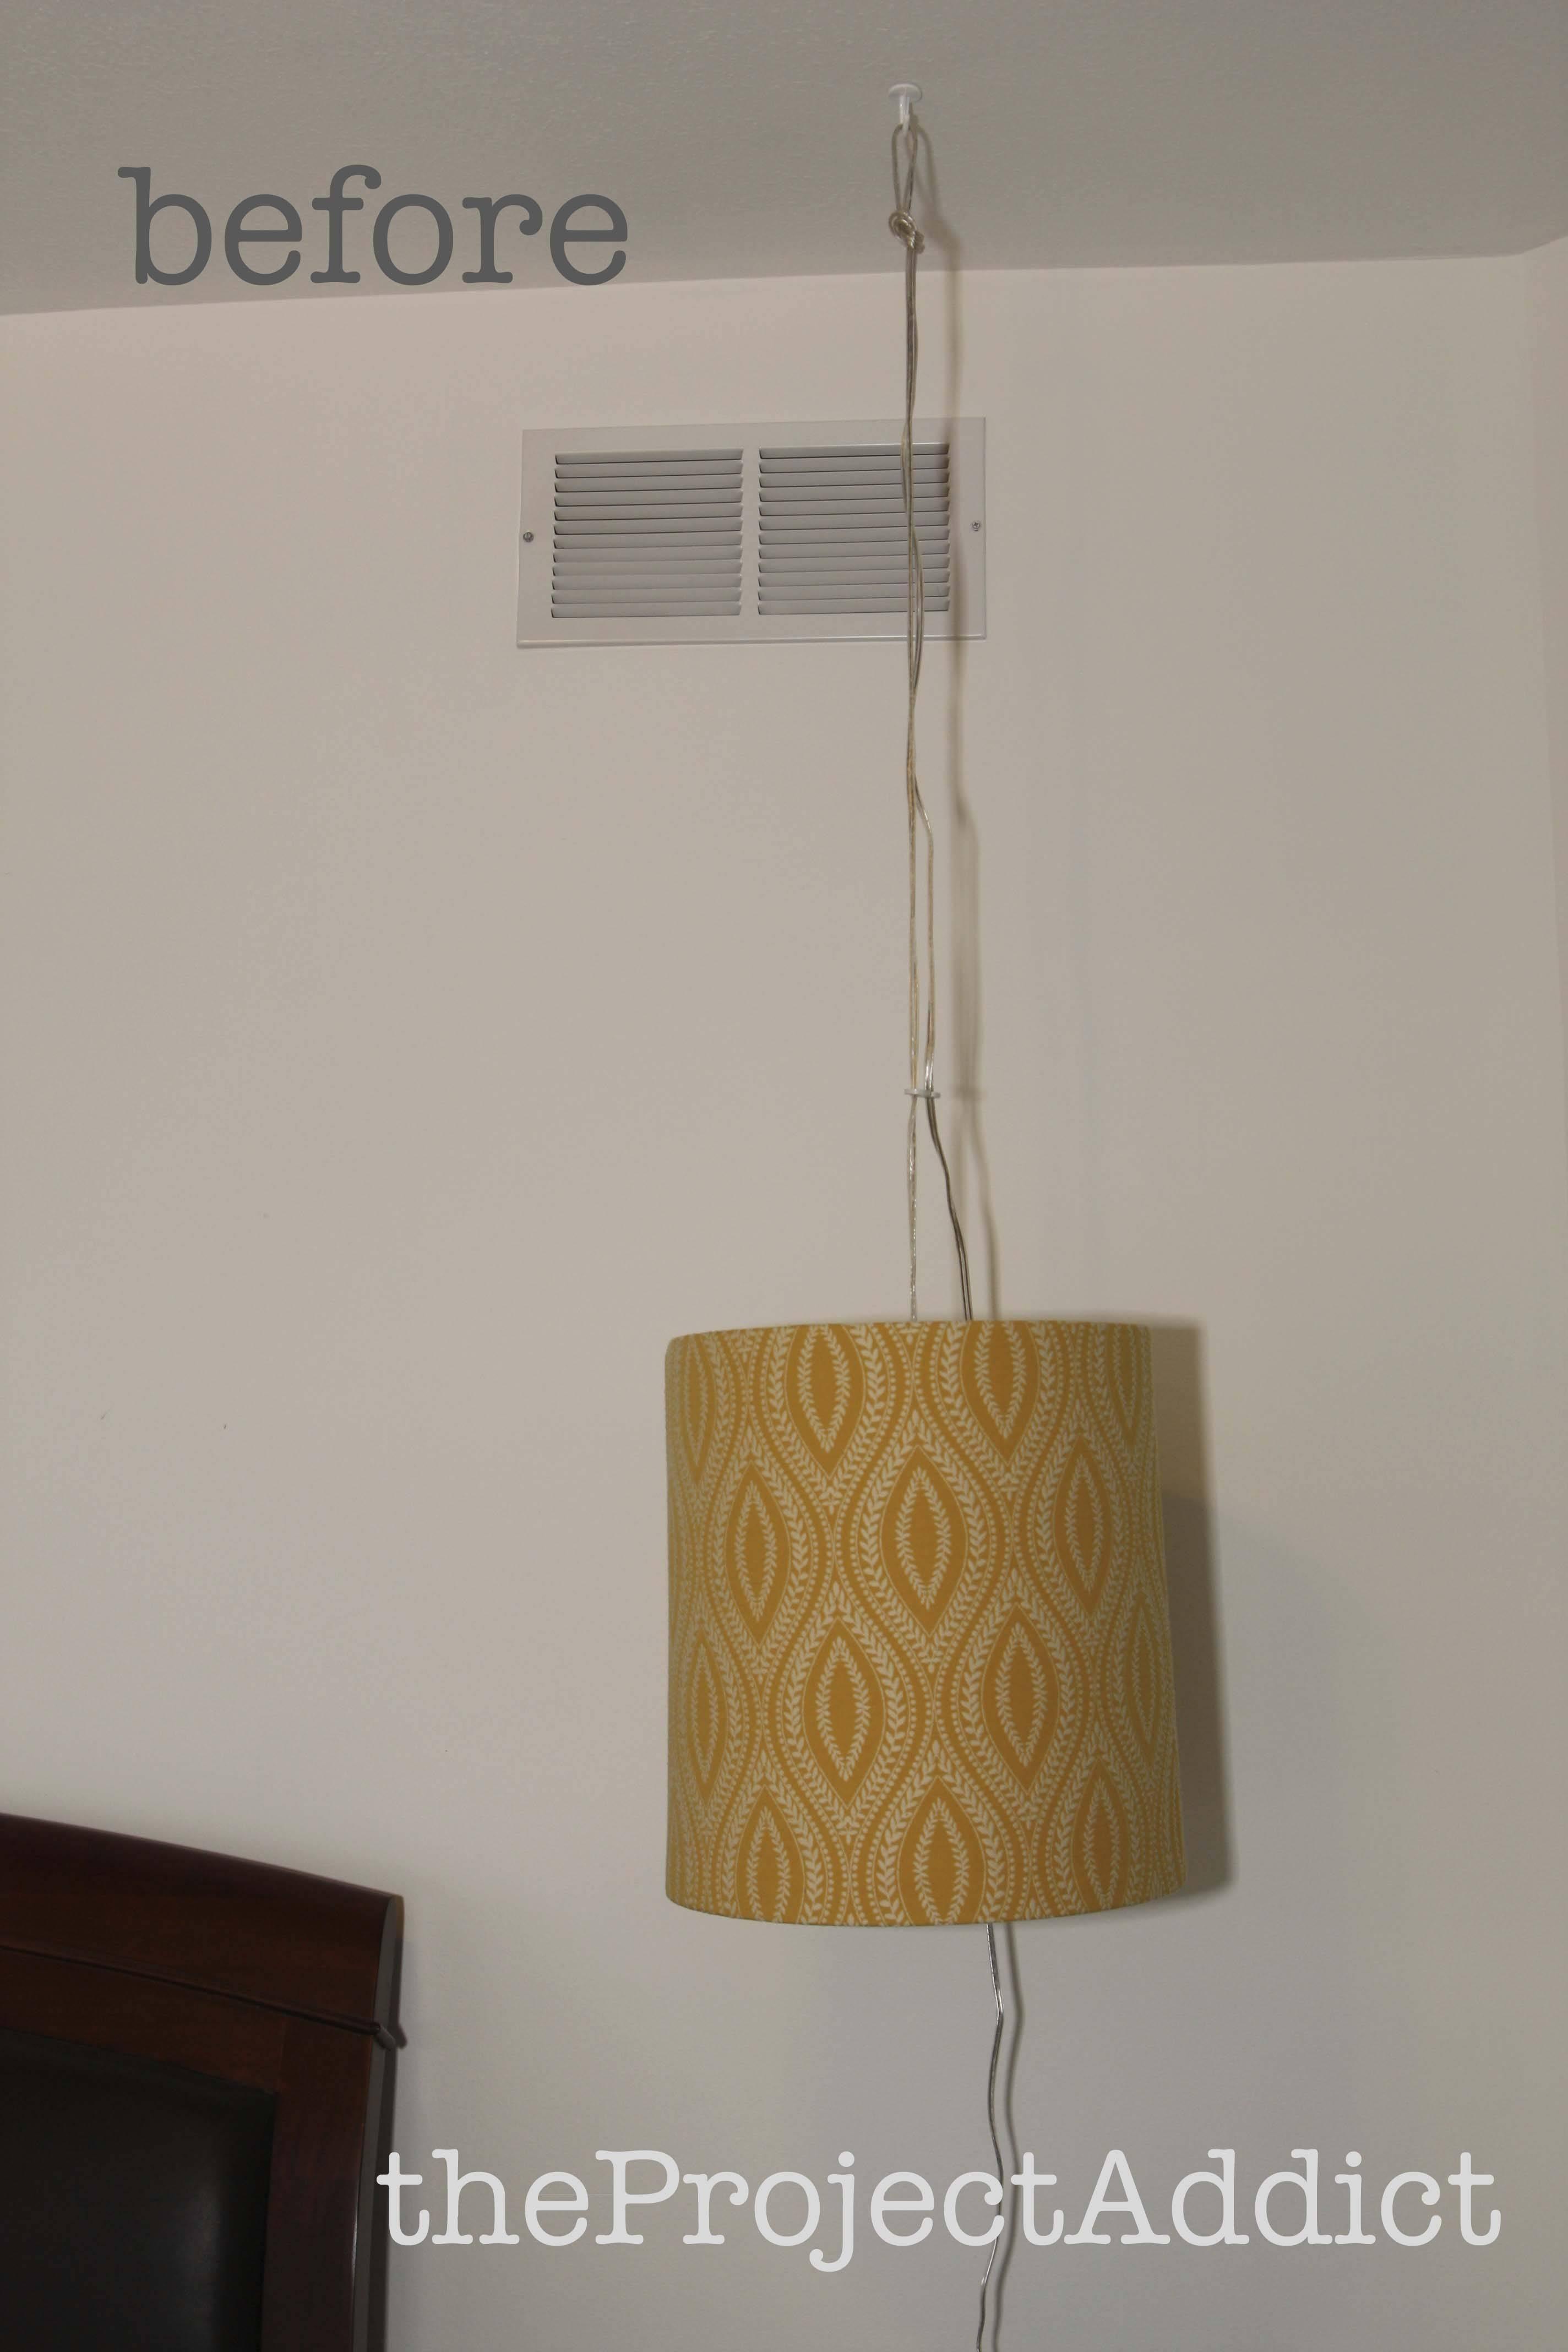 Fancy Plug In Hanging Pendant Lights 92 In Glass Pendant Light in Fancy Rope Pendant Lights (Image 7 of 15)